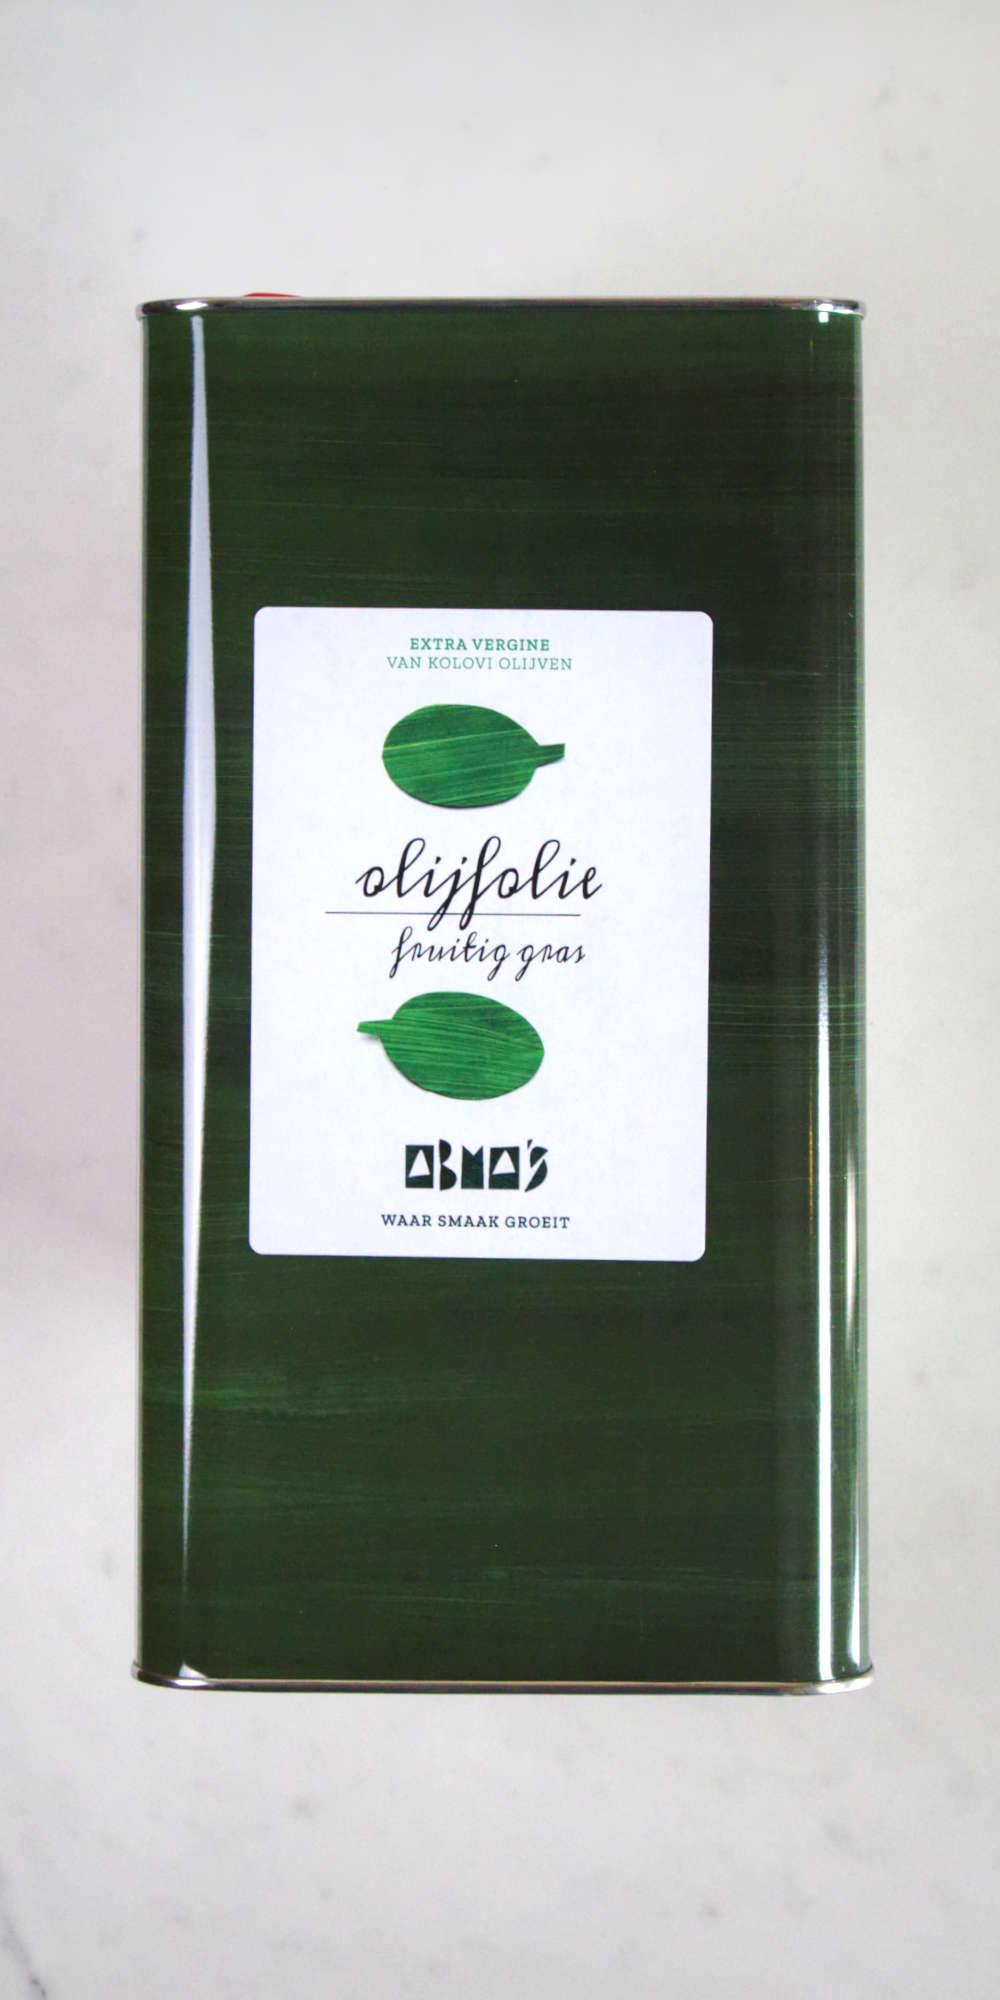 5L blik Abma's fruitig gras olijfolie.